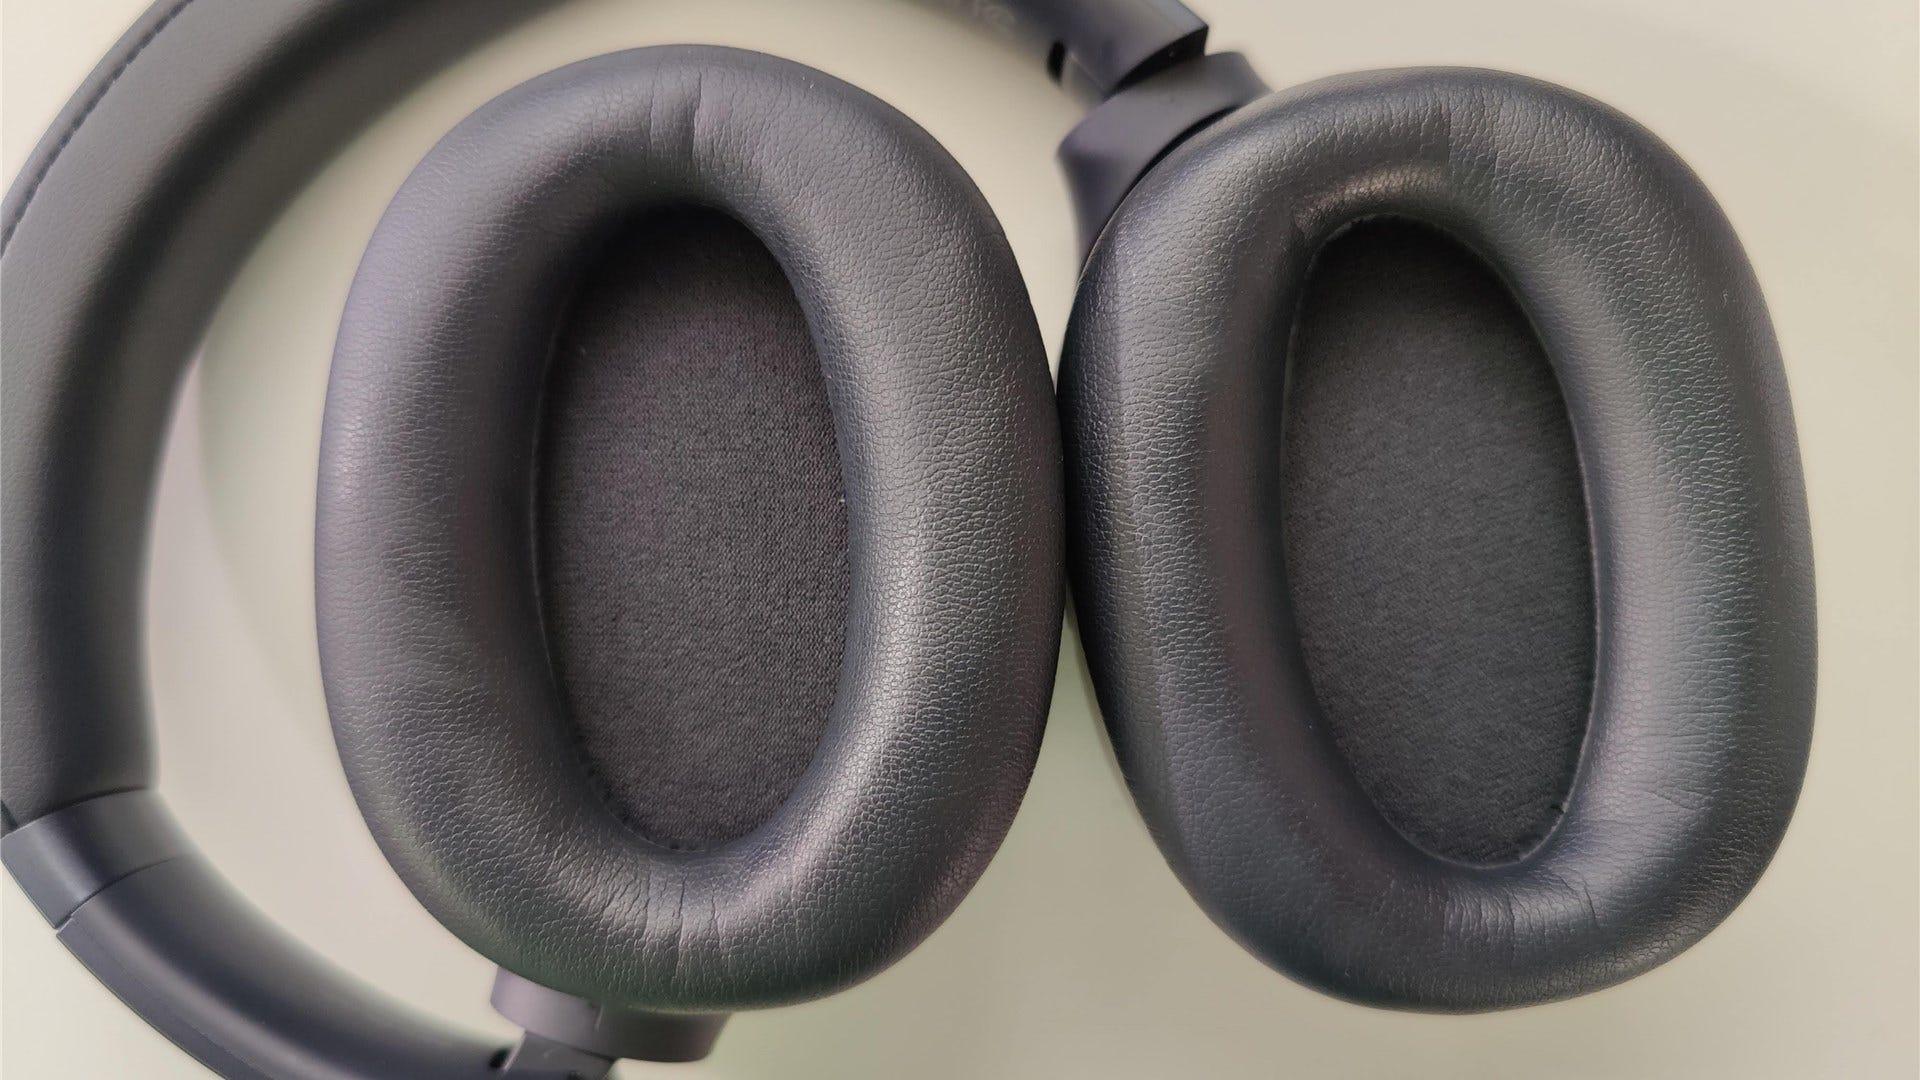 The earpads on the Razer Opus